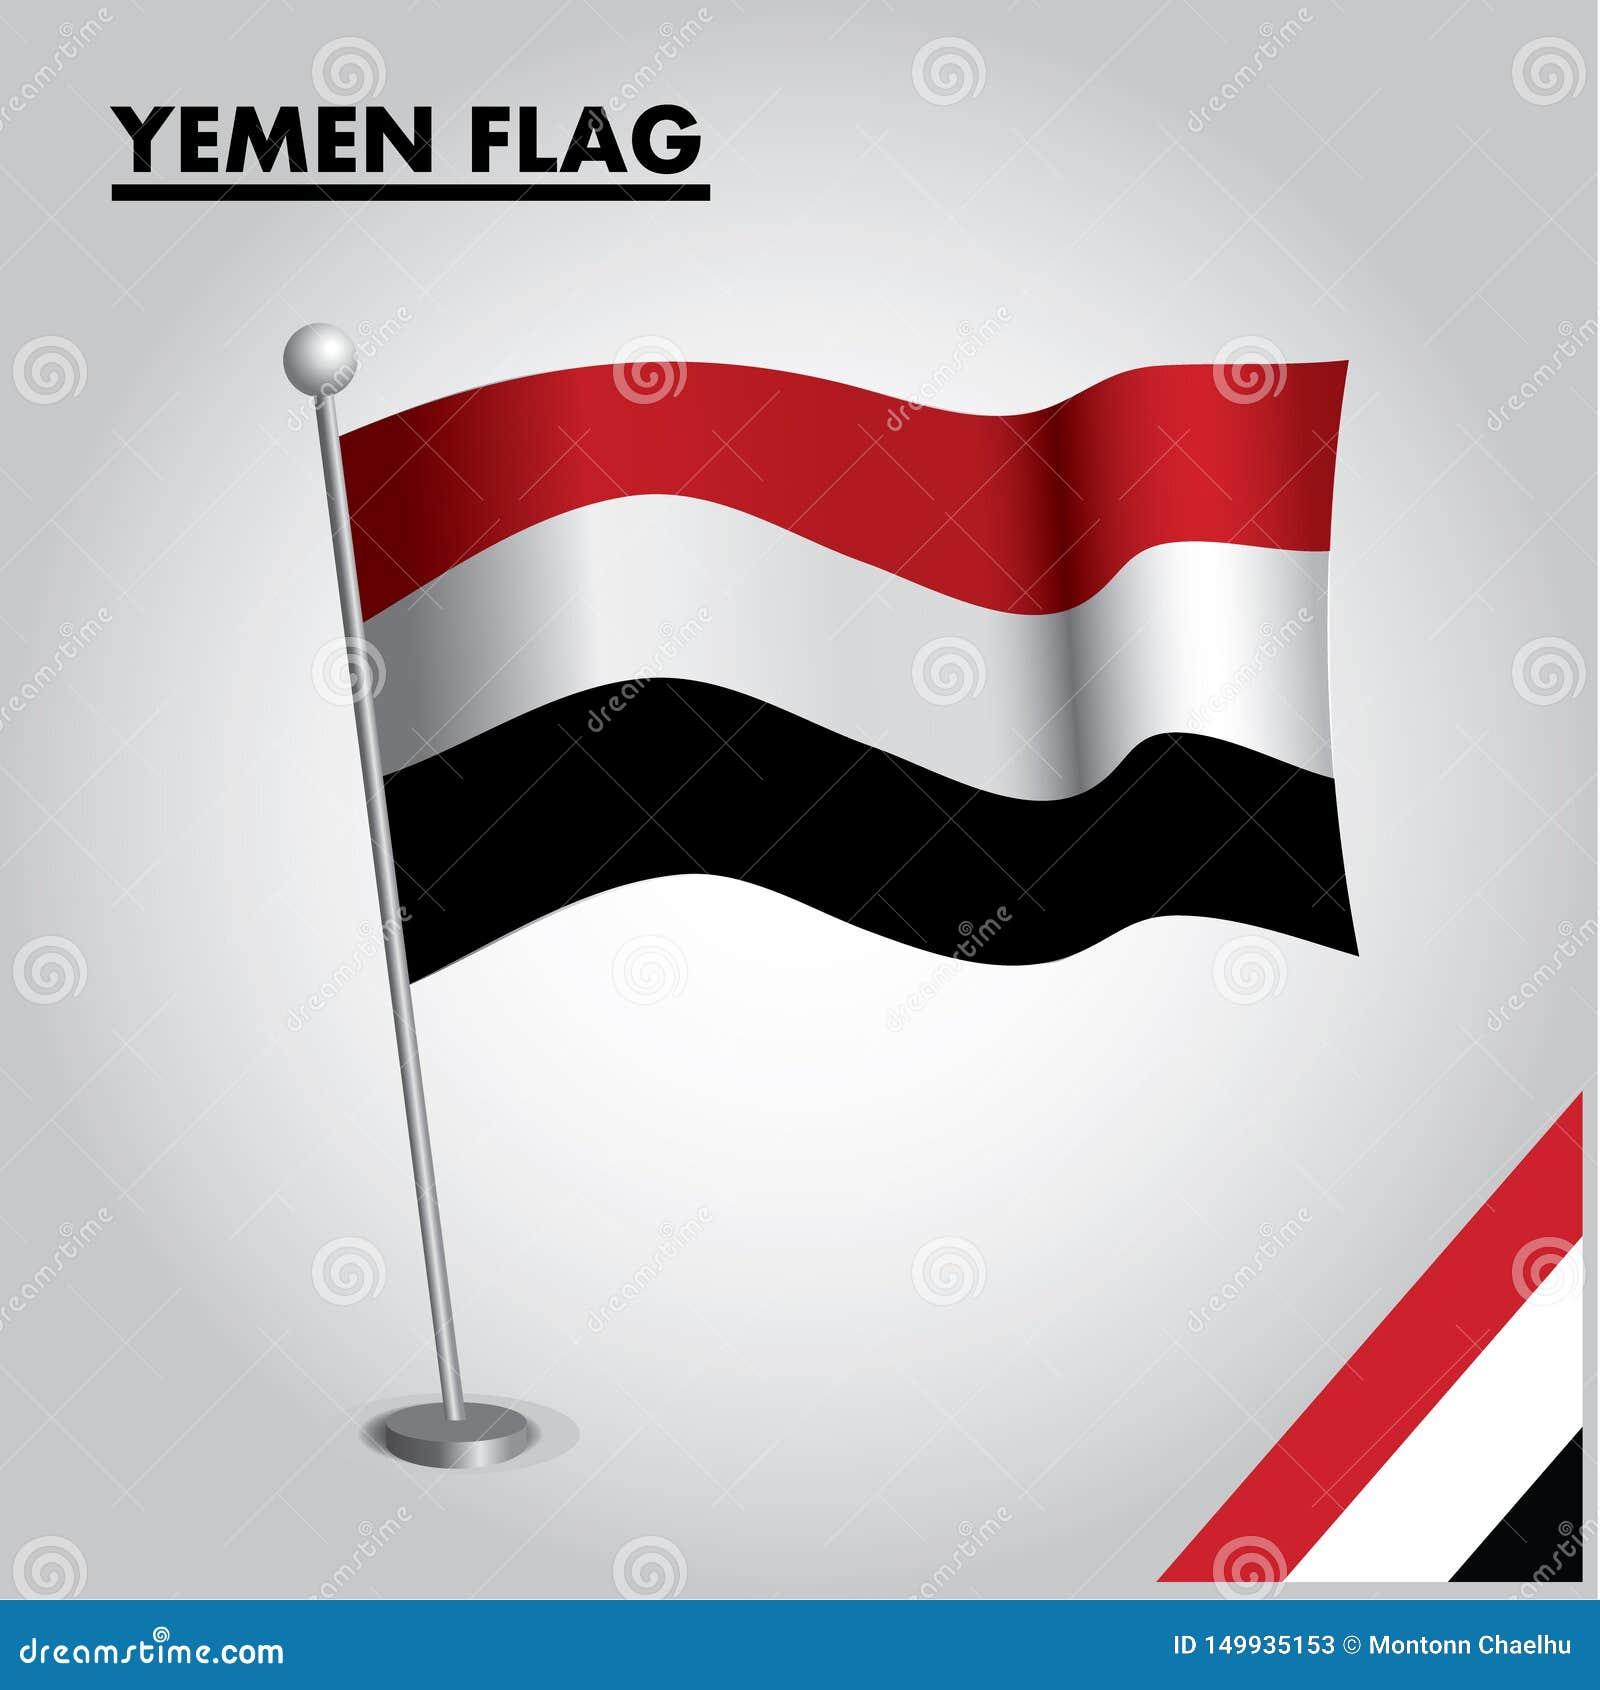 YEMEN flag National flag of YEMEN on a pole